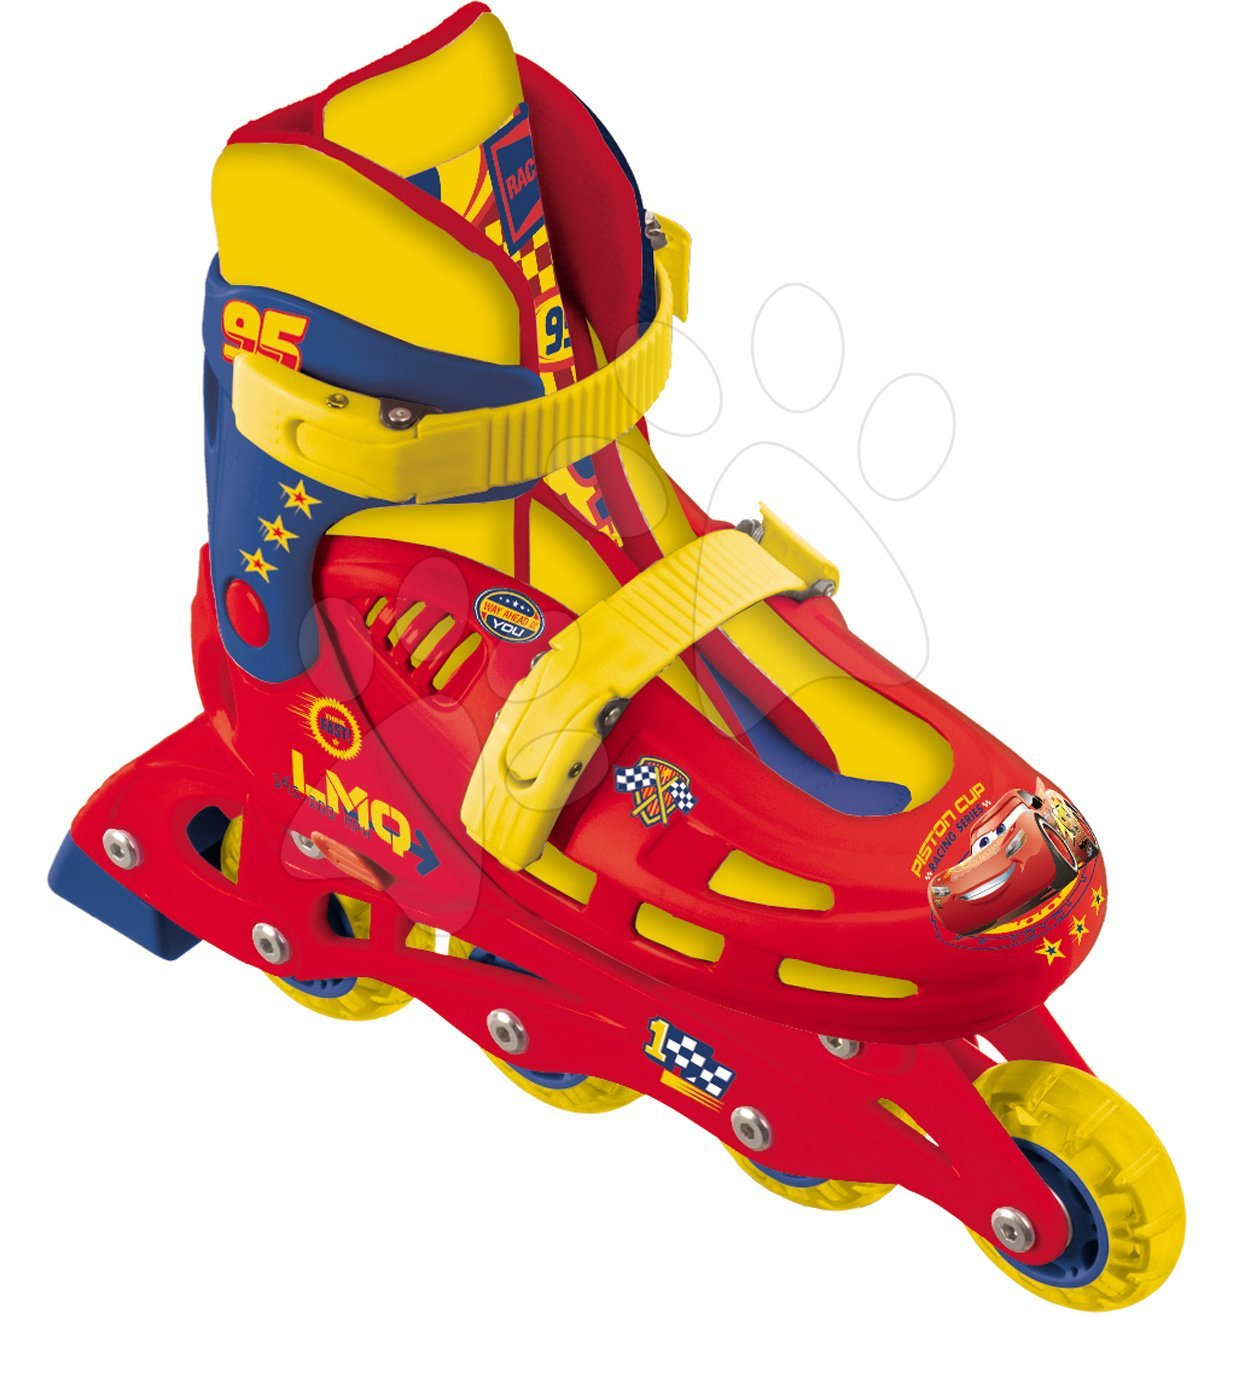 Mondo kolečkové brusle pro děti In Line Cars velikost 33-36 28164